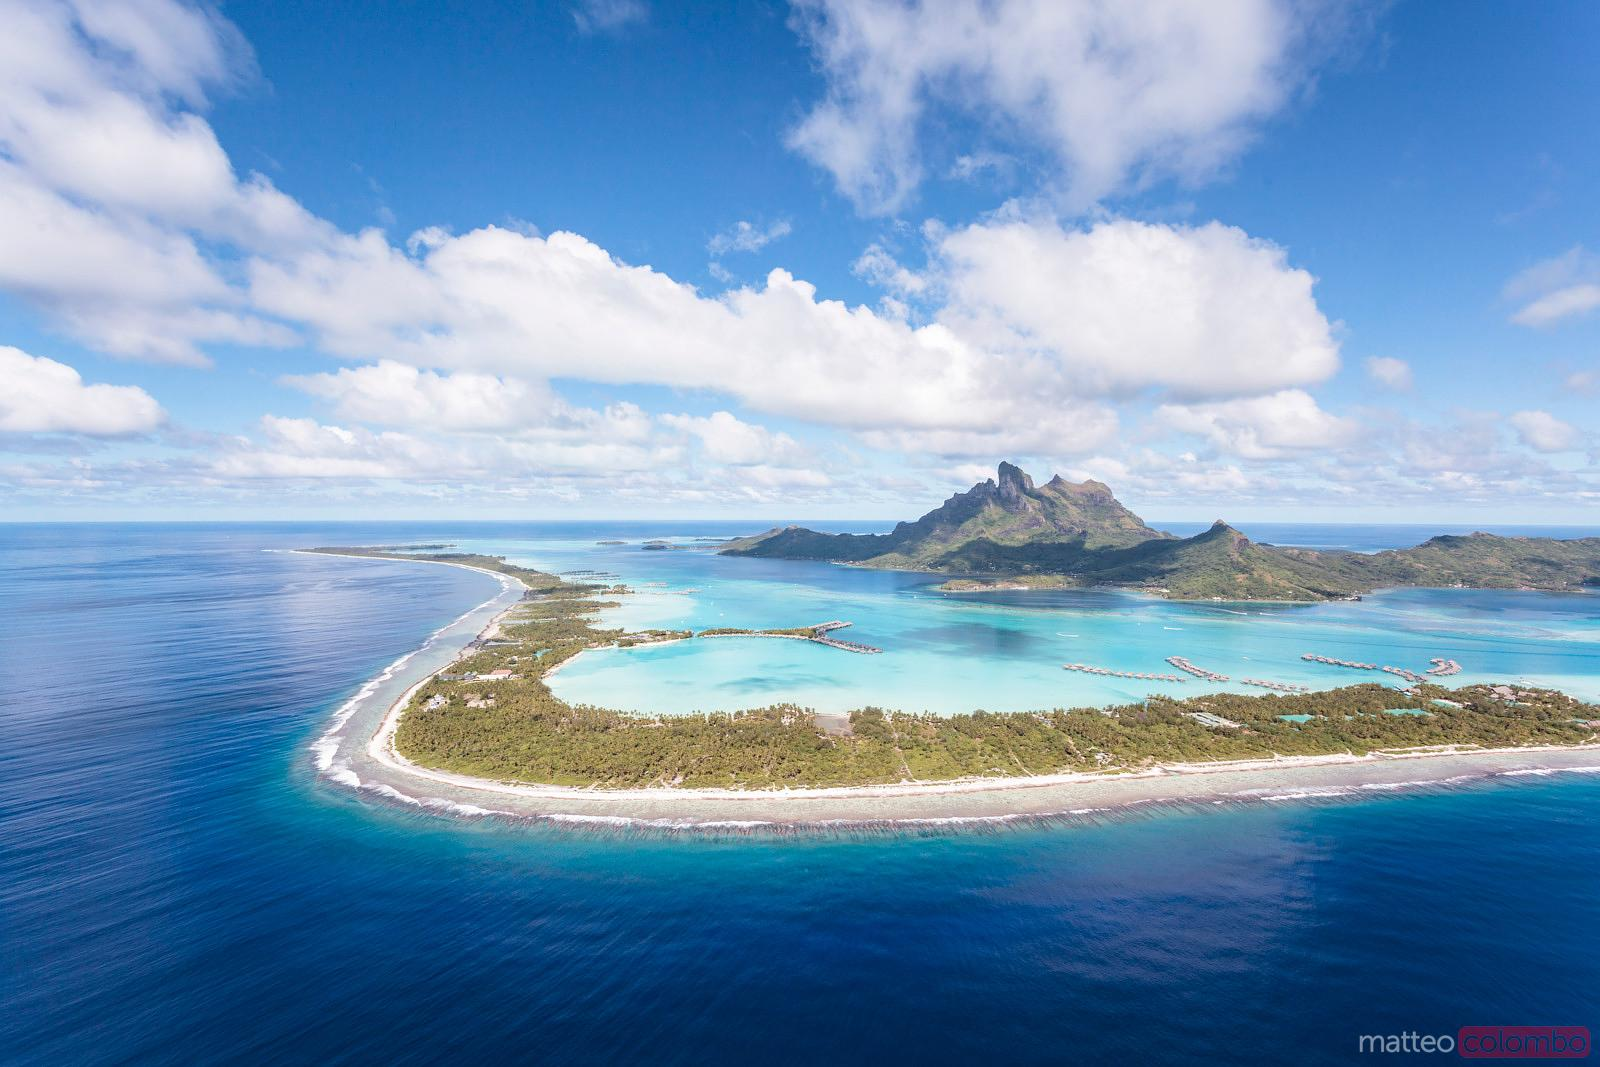 Matteo Colombo Travel Photography Aerial View Of Bora Bora